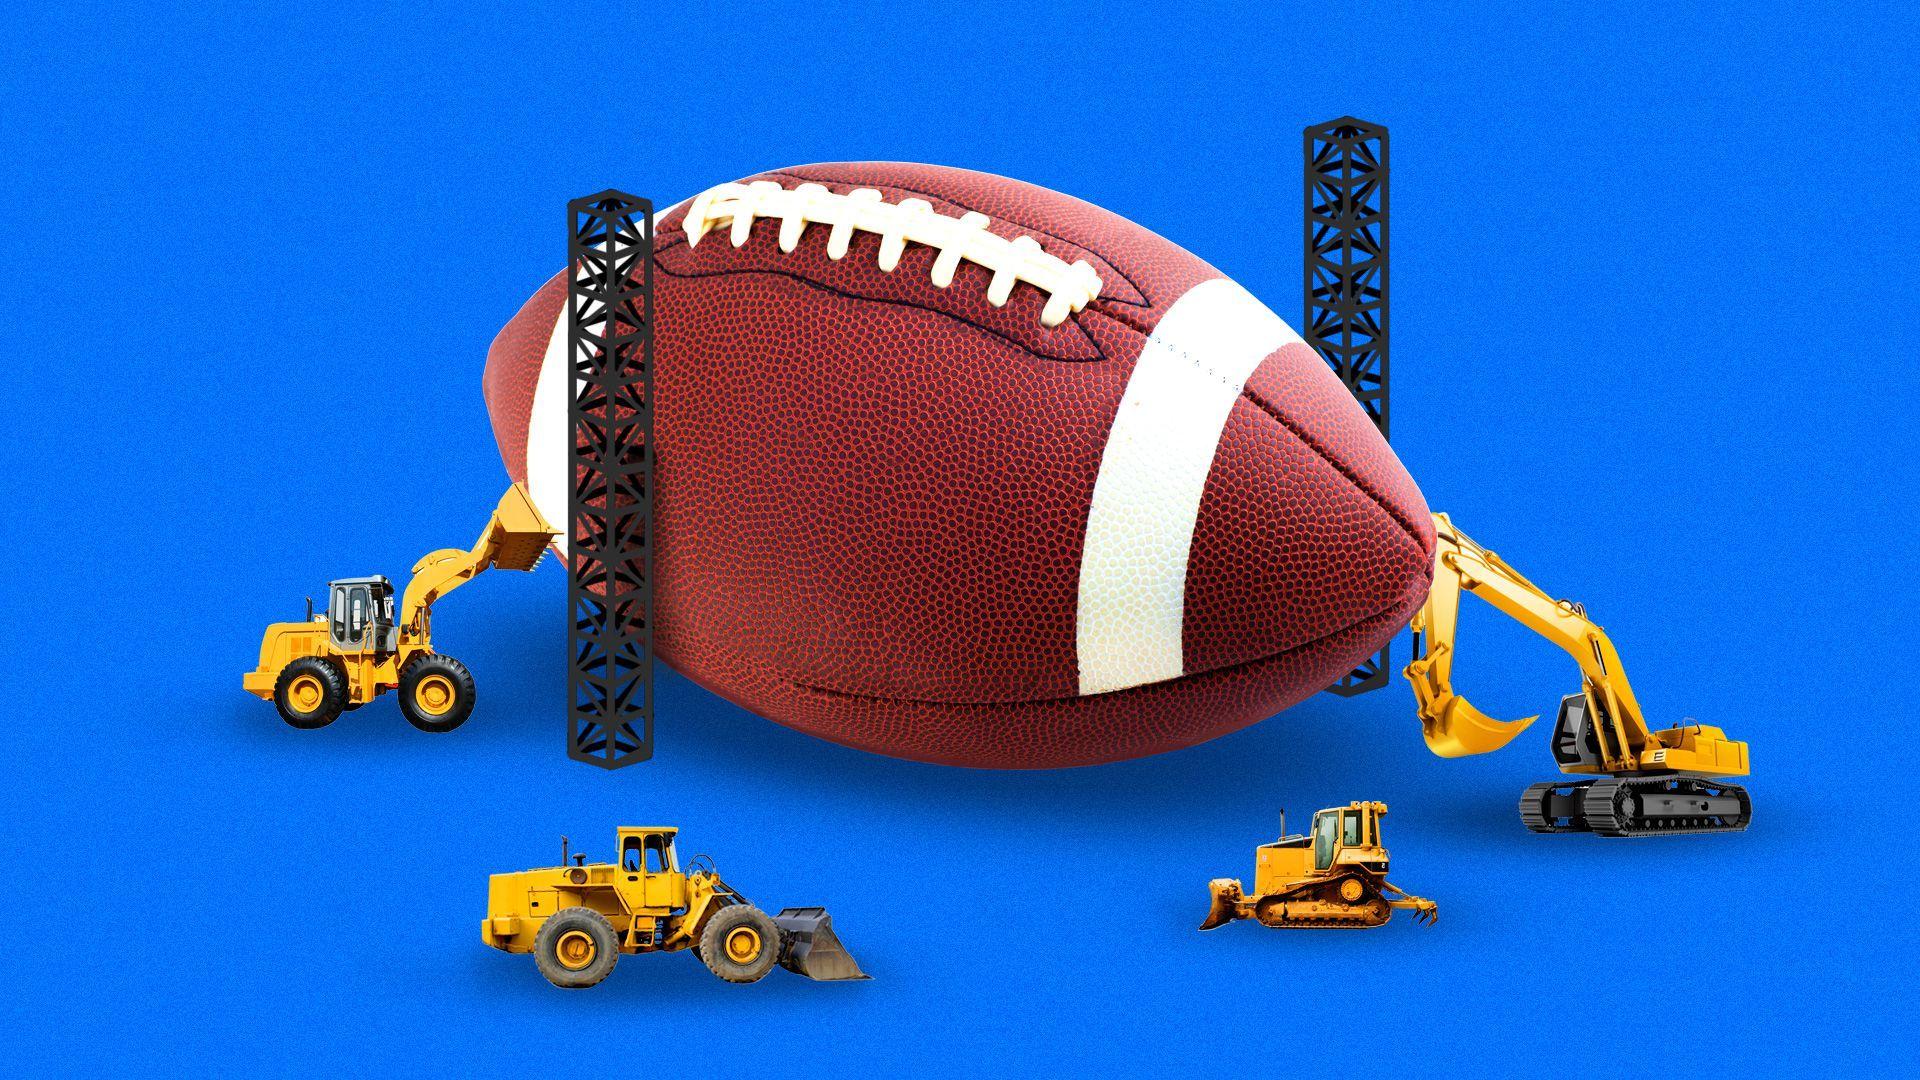 A football under construction.